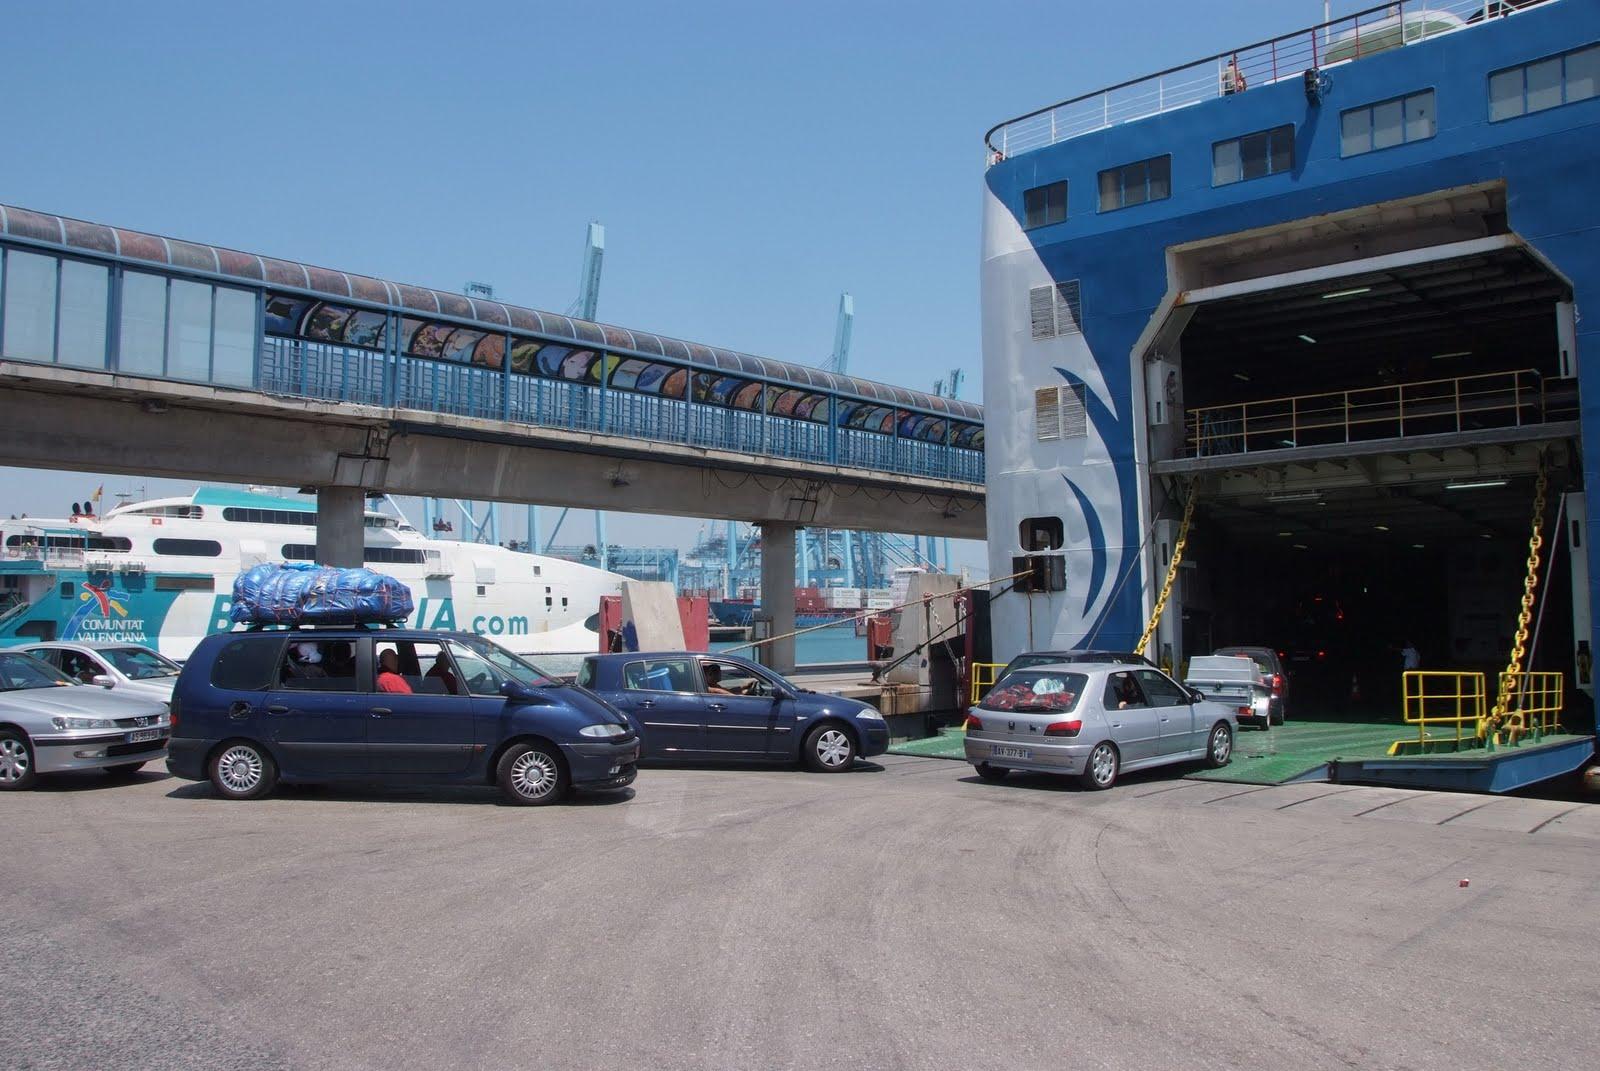 Puerto bah a de algeciras blog operaci n paso del estrecho - Puerto de algeciras hoy ...